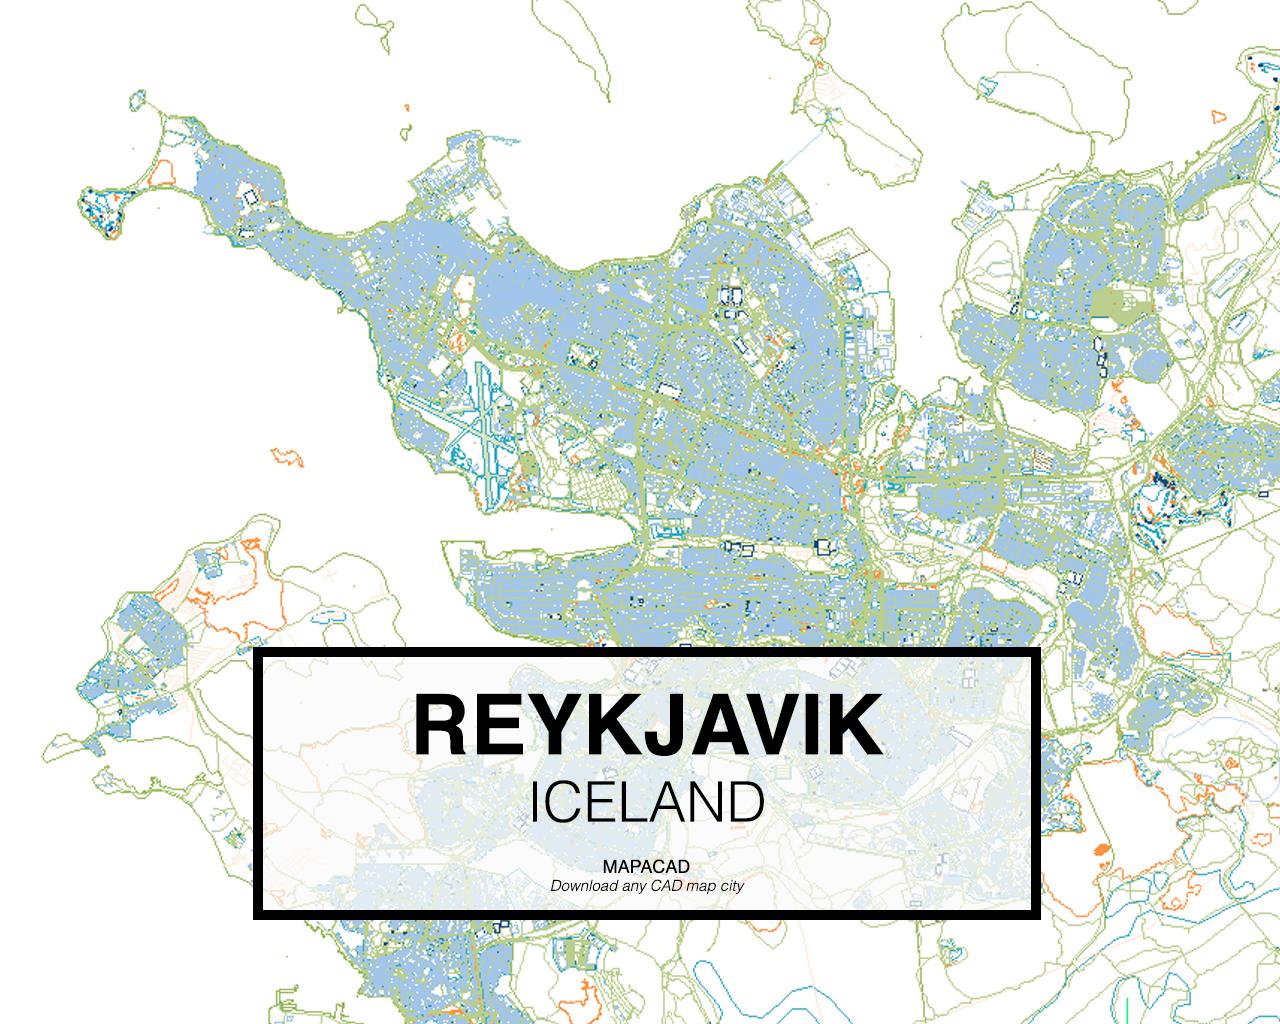 Reykjavik dwg mapacad gumiabroncs Image collections